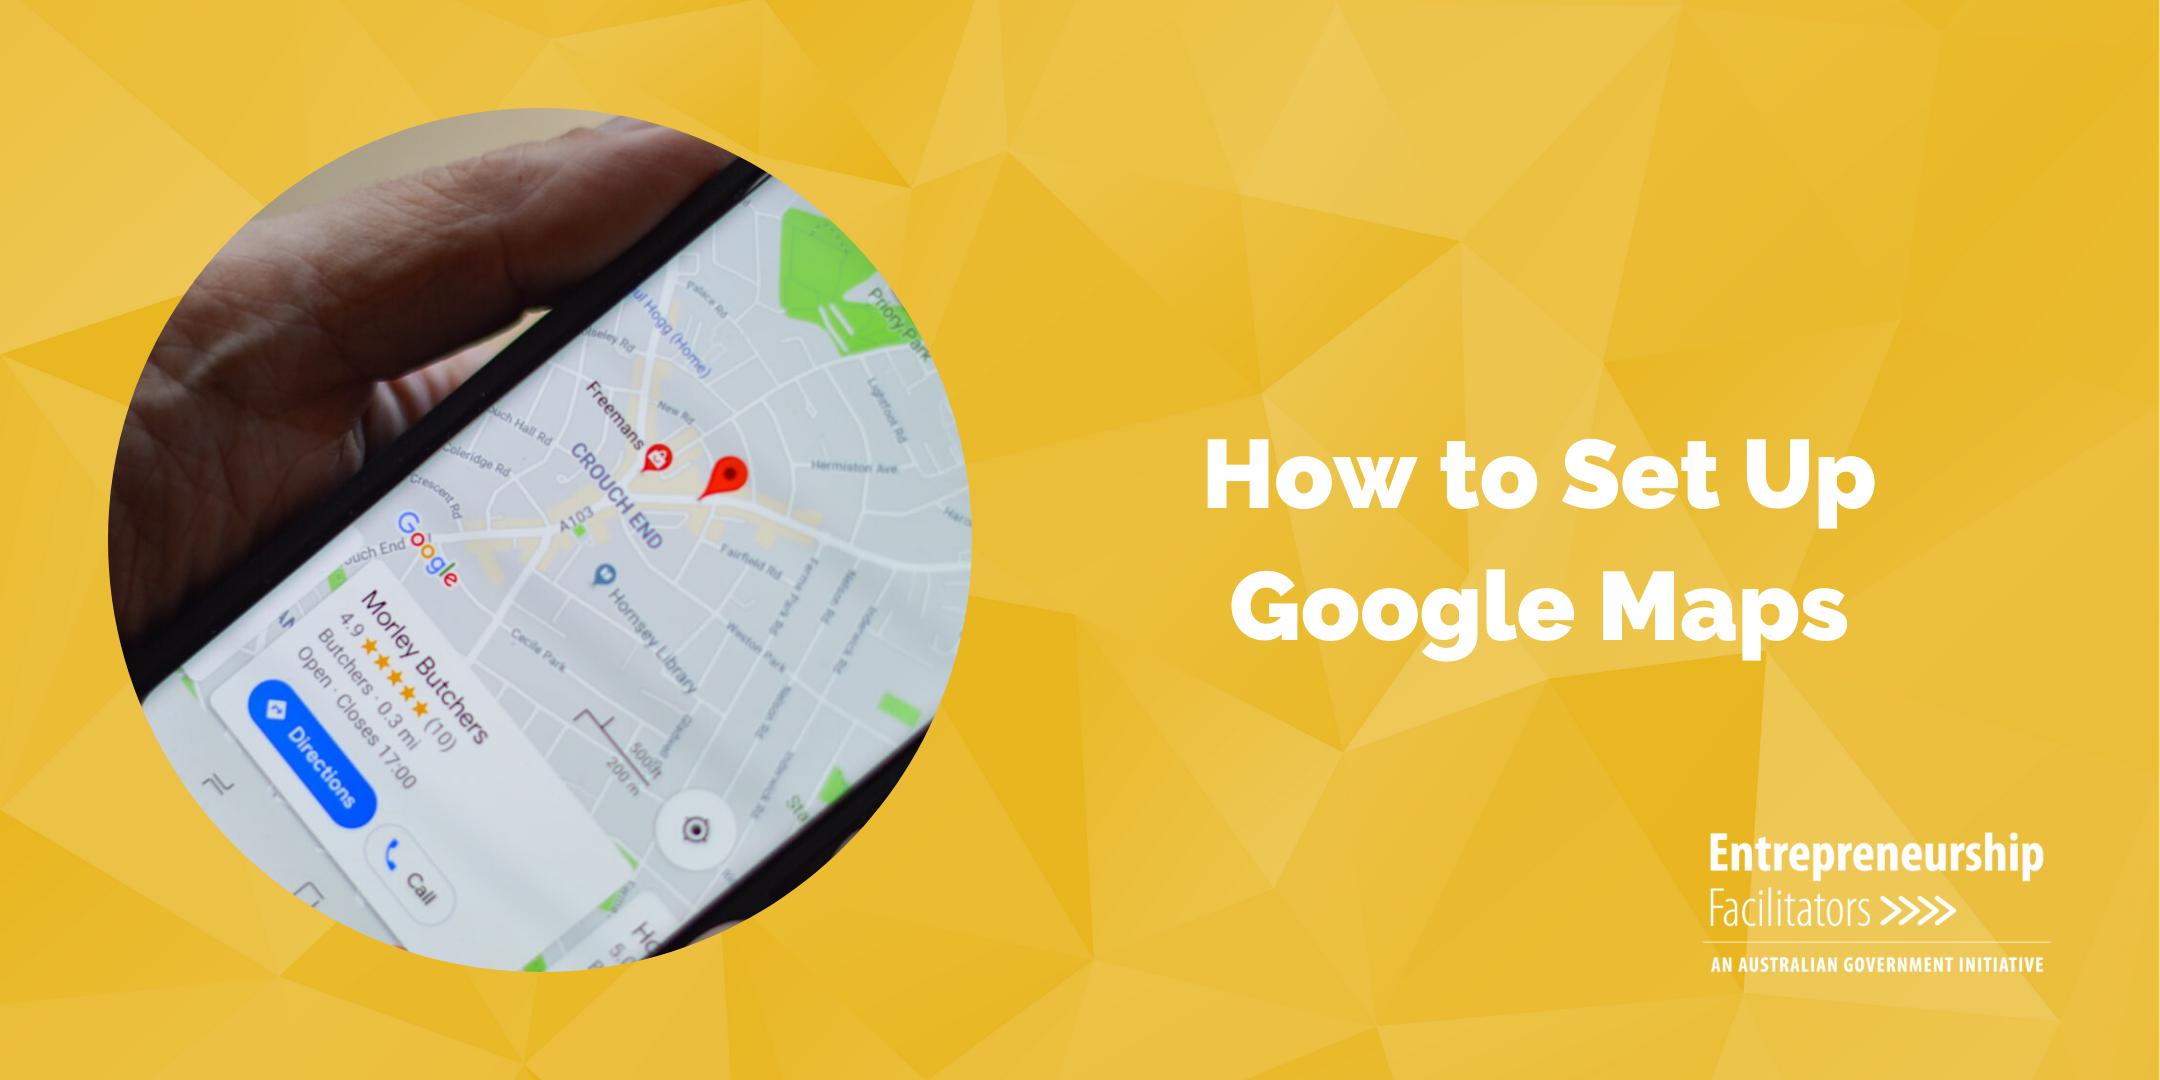 WEBINAR - How to Set Up Google Maps